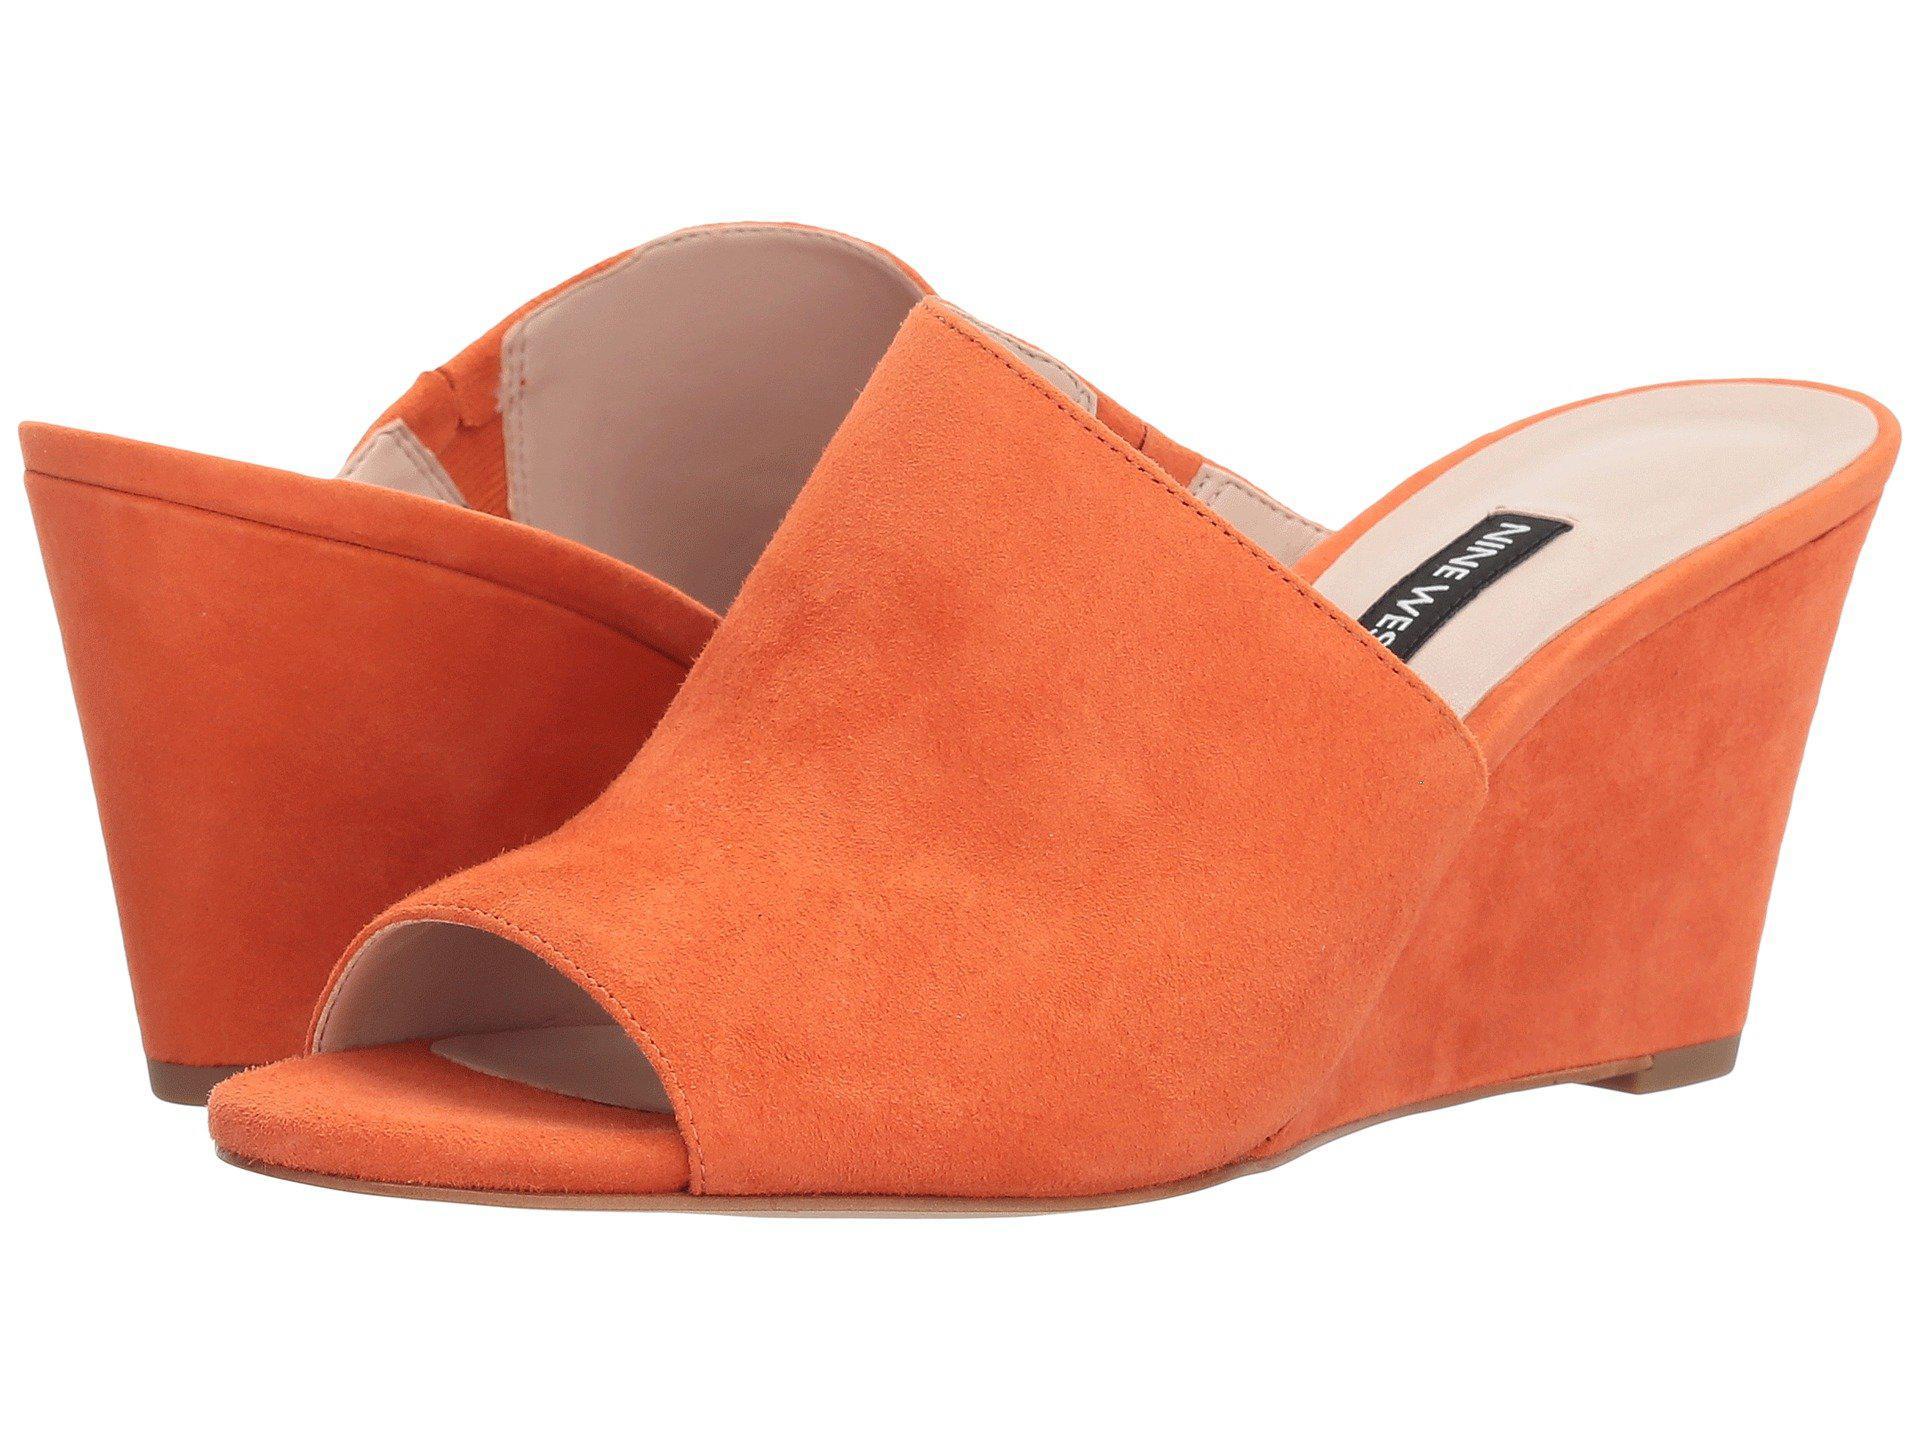 285064045dd1 Lyst - Nine West Janissah Slide Sandal in Orange - Save 23%